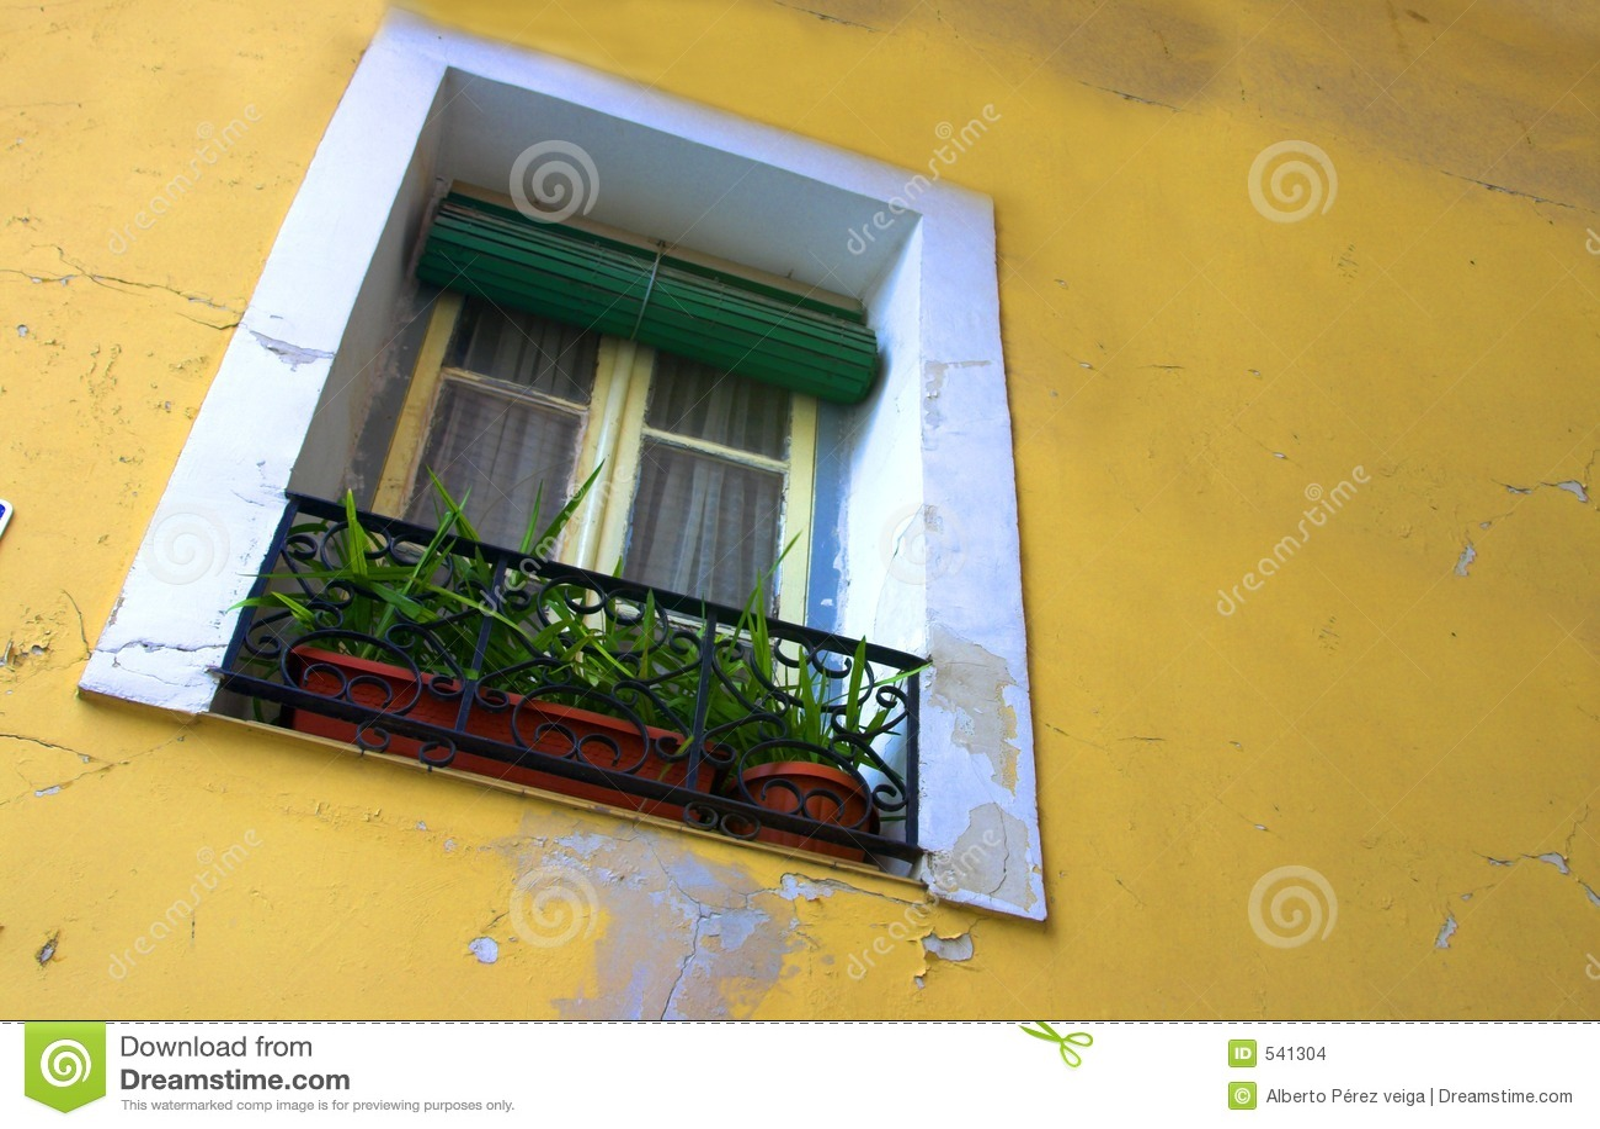 Download 墙壁视窗 库存照片. 图片 包括有 明信片, 旅途, 生长, 大竺葵, 砂岩, 法国, 膏药, 南部, 日历 - 541304